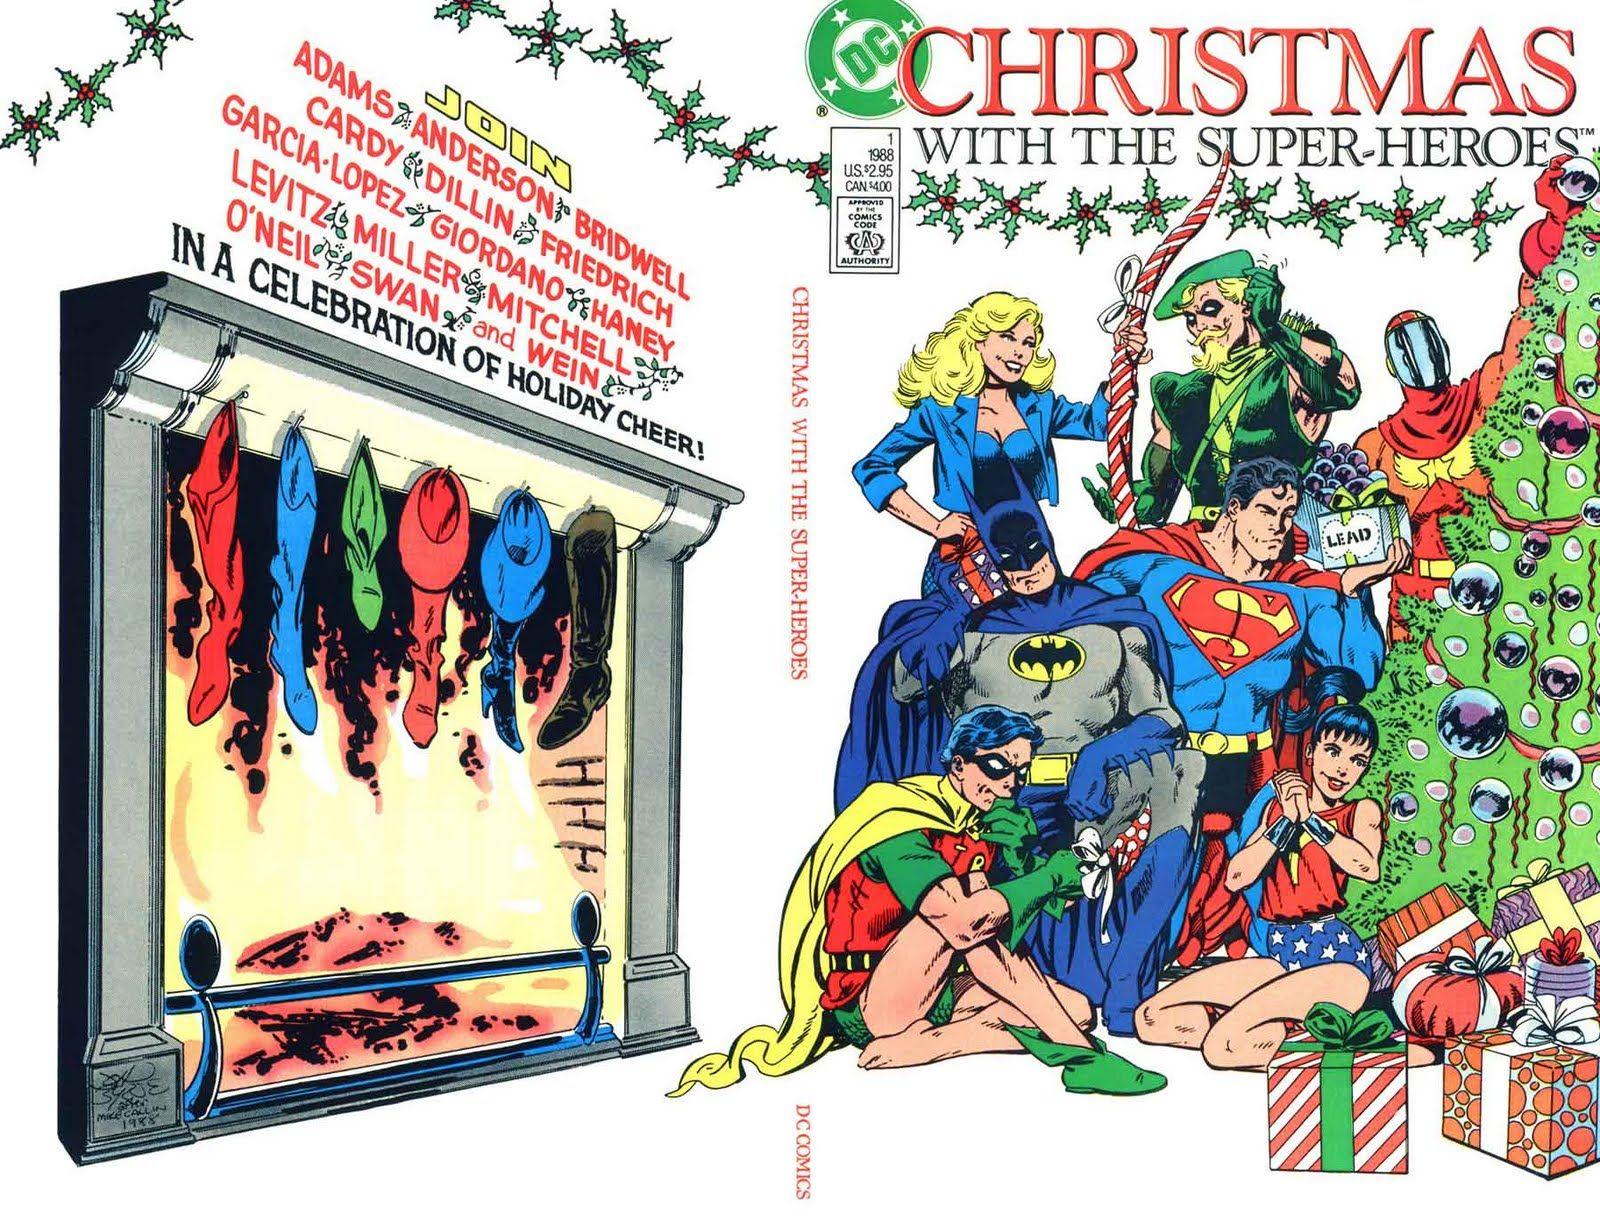 Christmas with the Superheroes | Comics | Pinterest | Superheroes ...